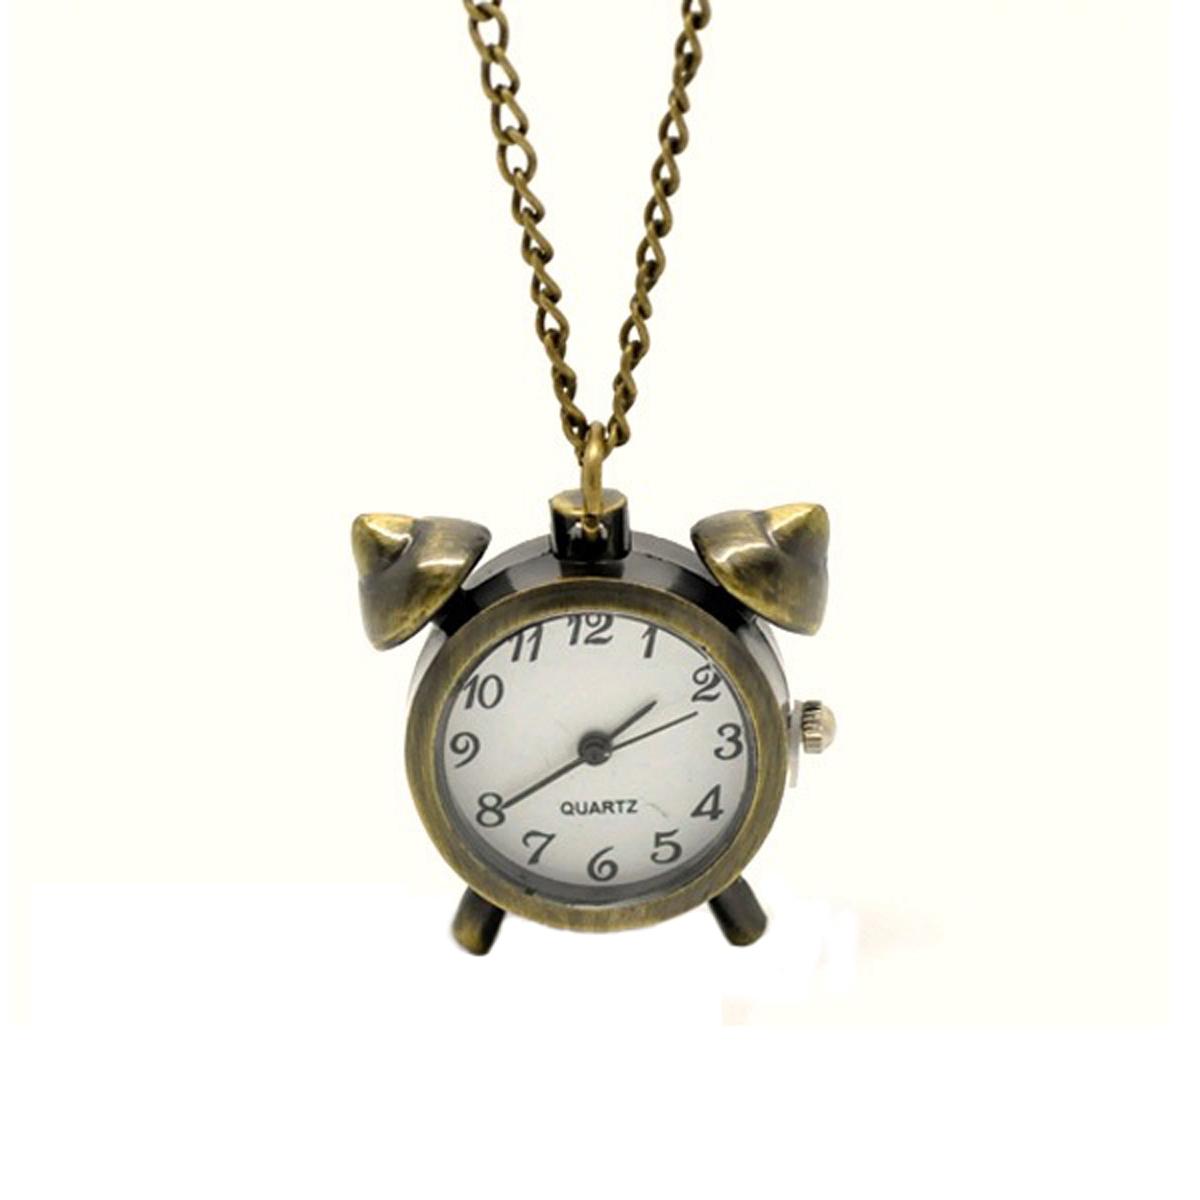 Кулон-часы Будильник. ANTIK-041 ( ANTIK-041 )